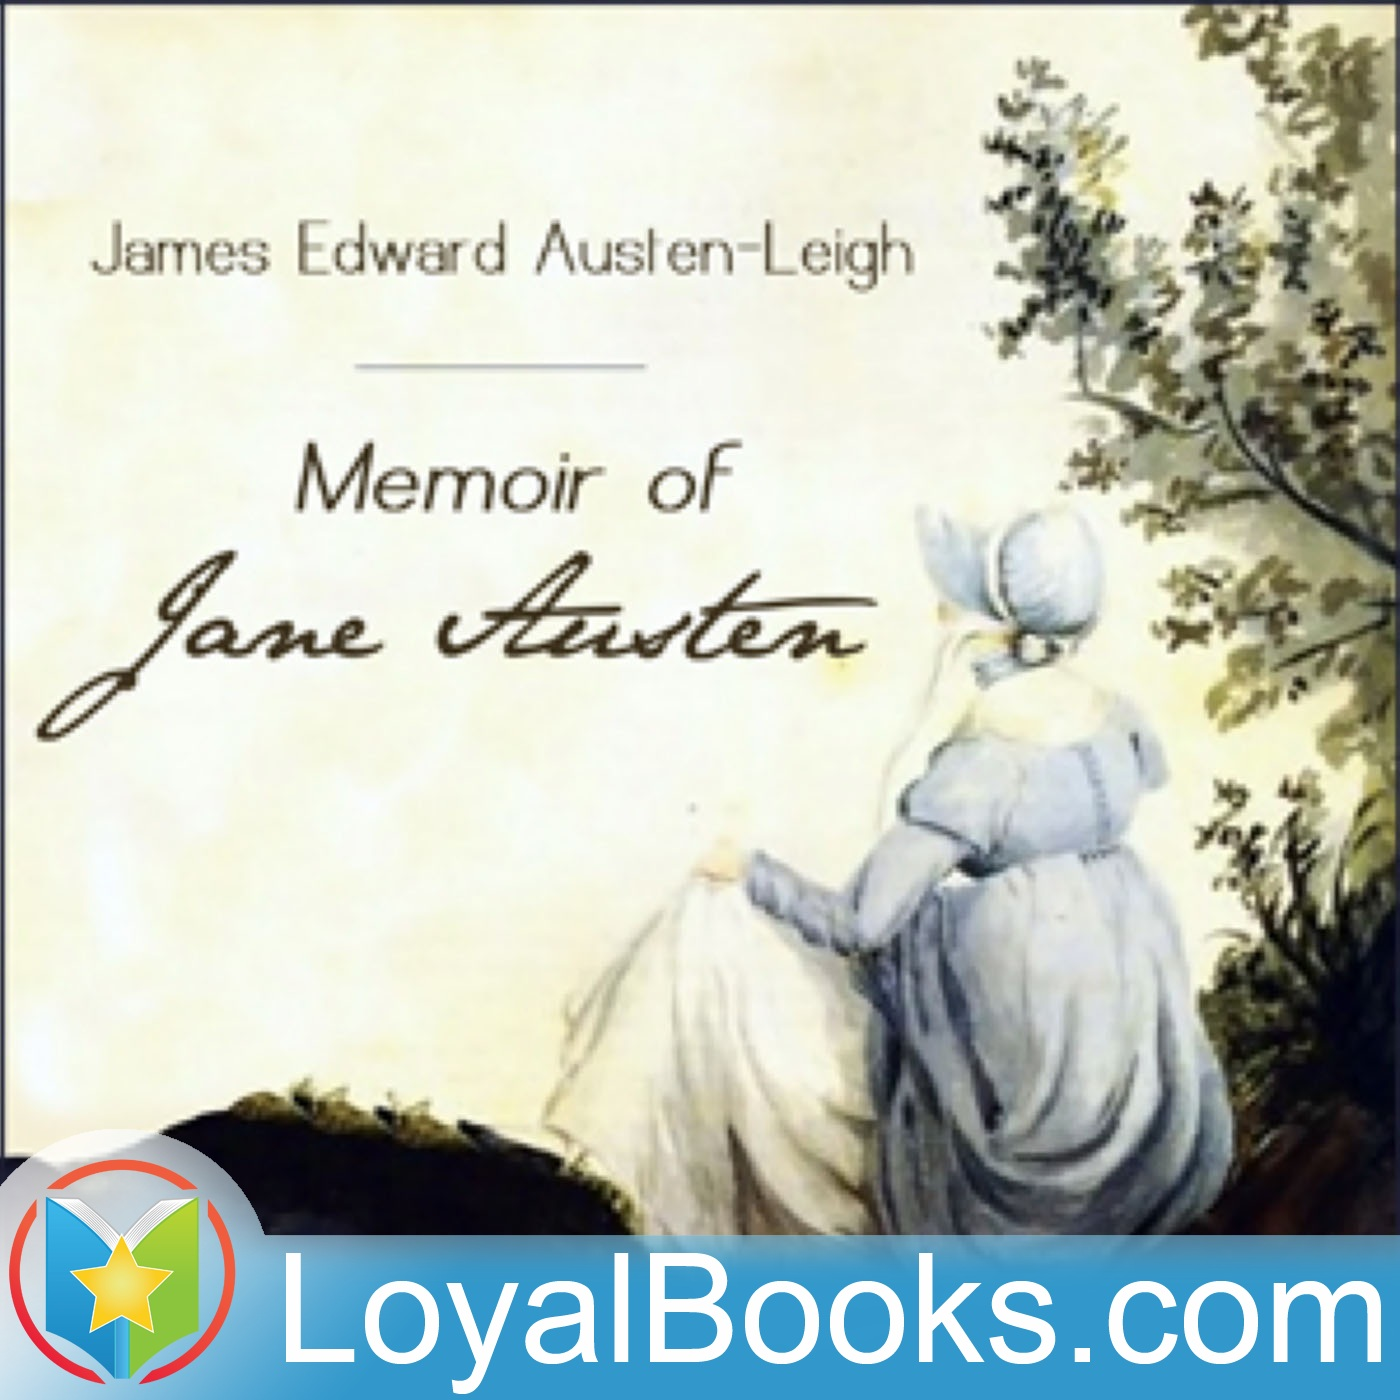 <![CDATA[Memoir of Jane Austen by James Edward Austen-Leigh]]>